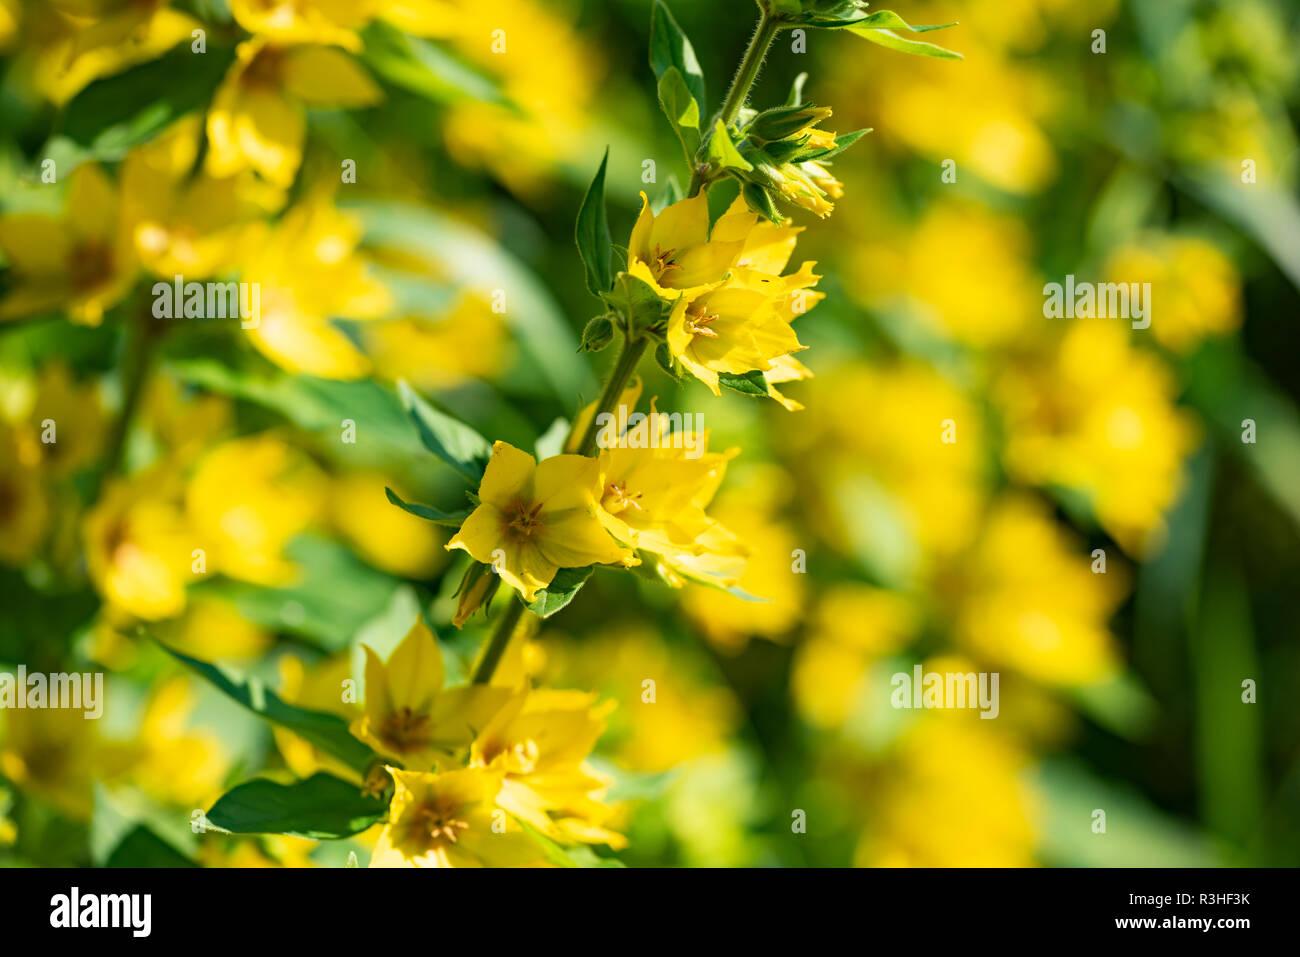 Yellow flowers of a perennial plant - Lysimachia vulgaris, close up. Stock Photo